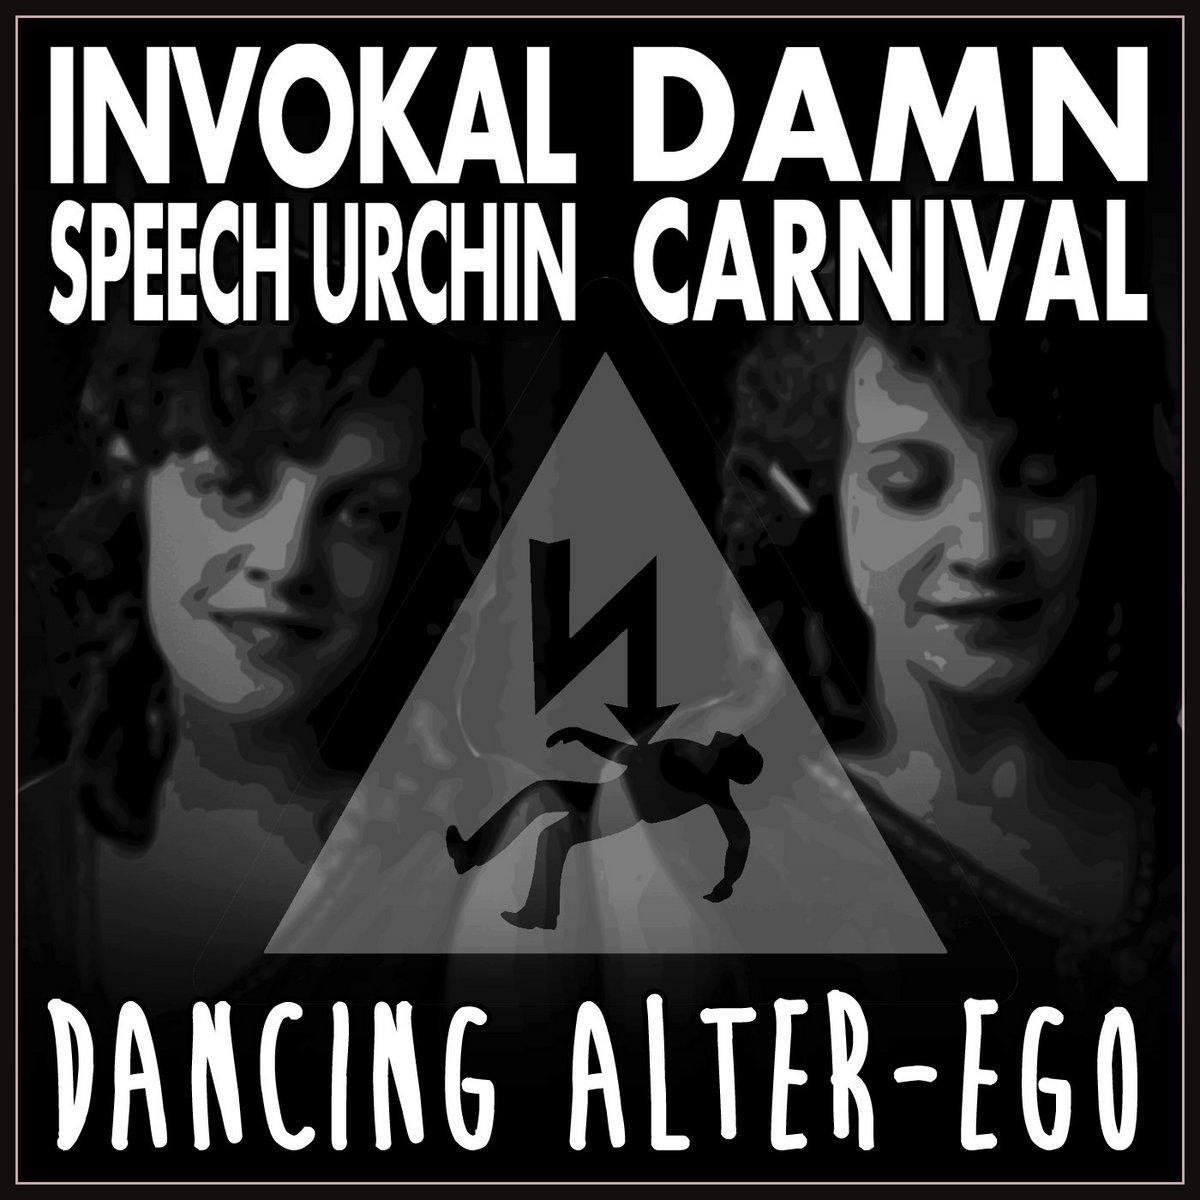 Dancing Alter-Ego (free download) | Damn Carnival